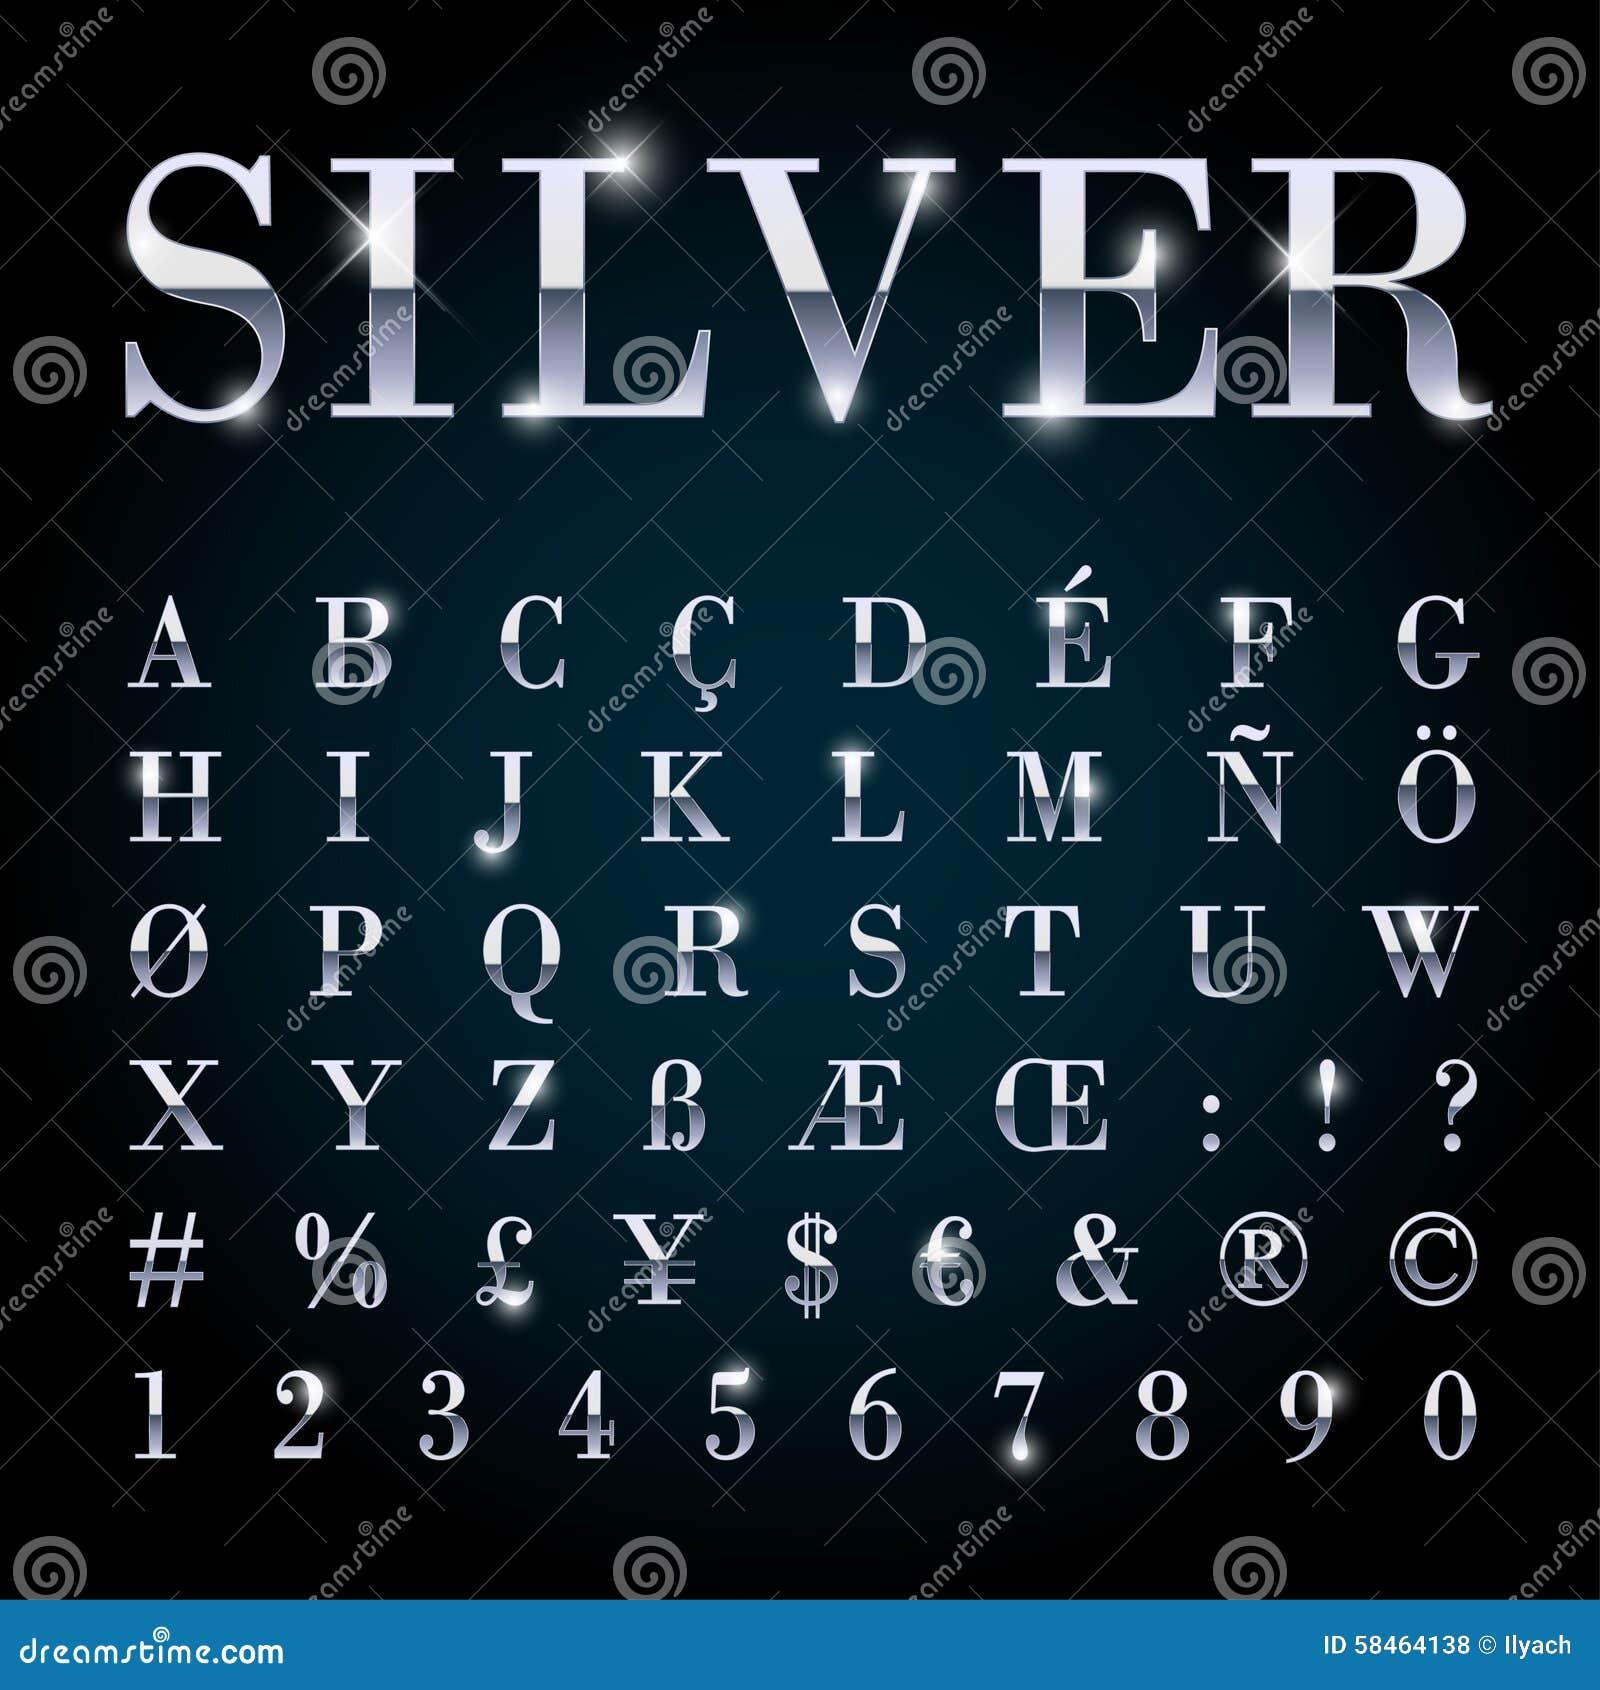 n Alphabet in Diamond images